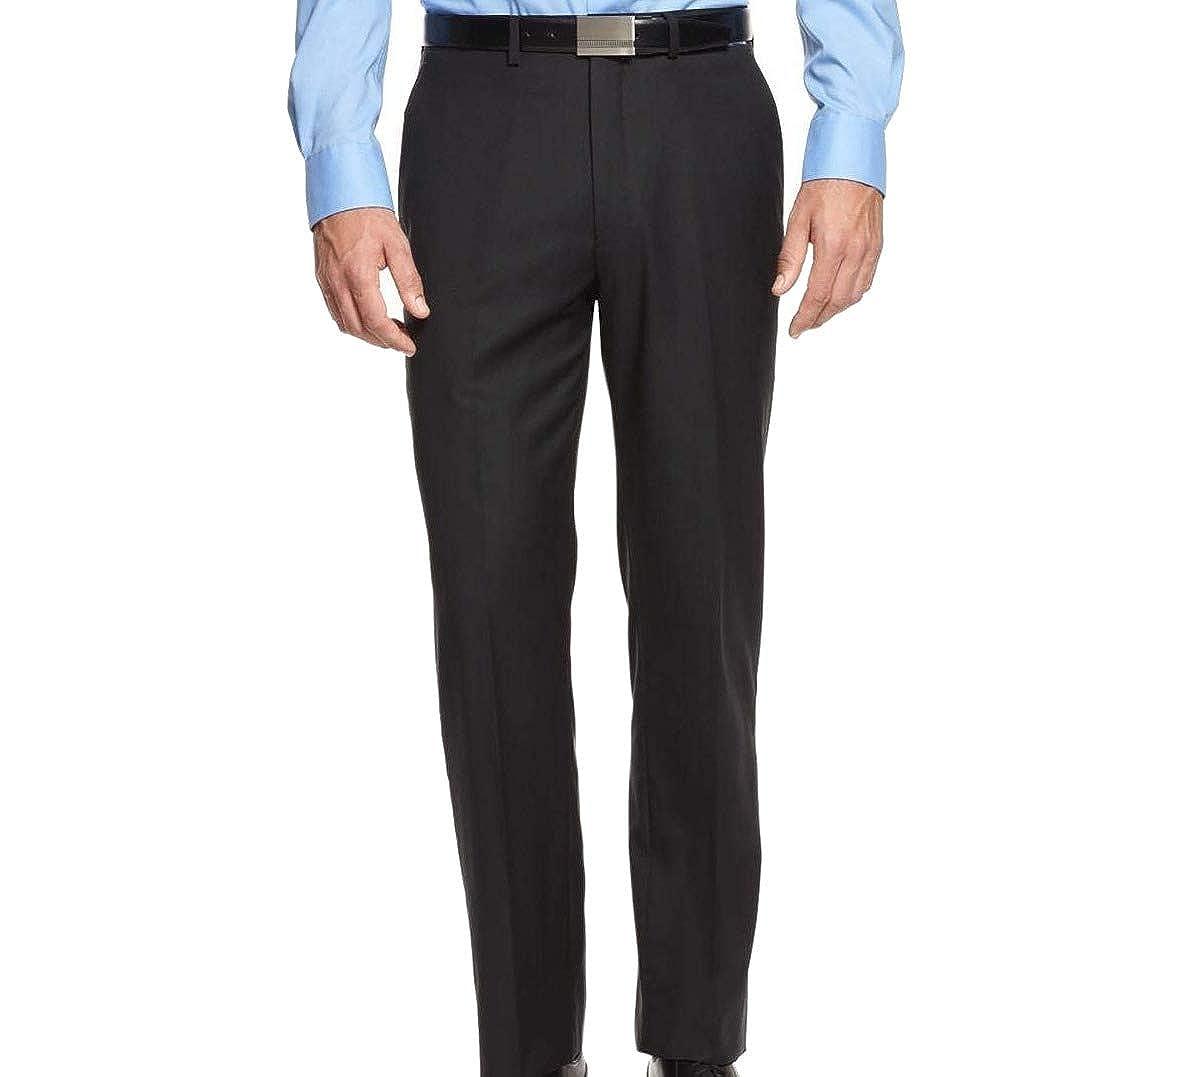 Ryan Seacrest 32X34 Modern Fit Dress Flat Front Wool Pants Blues